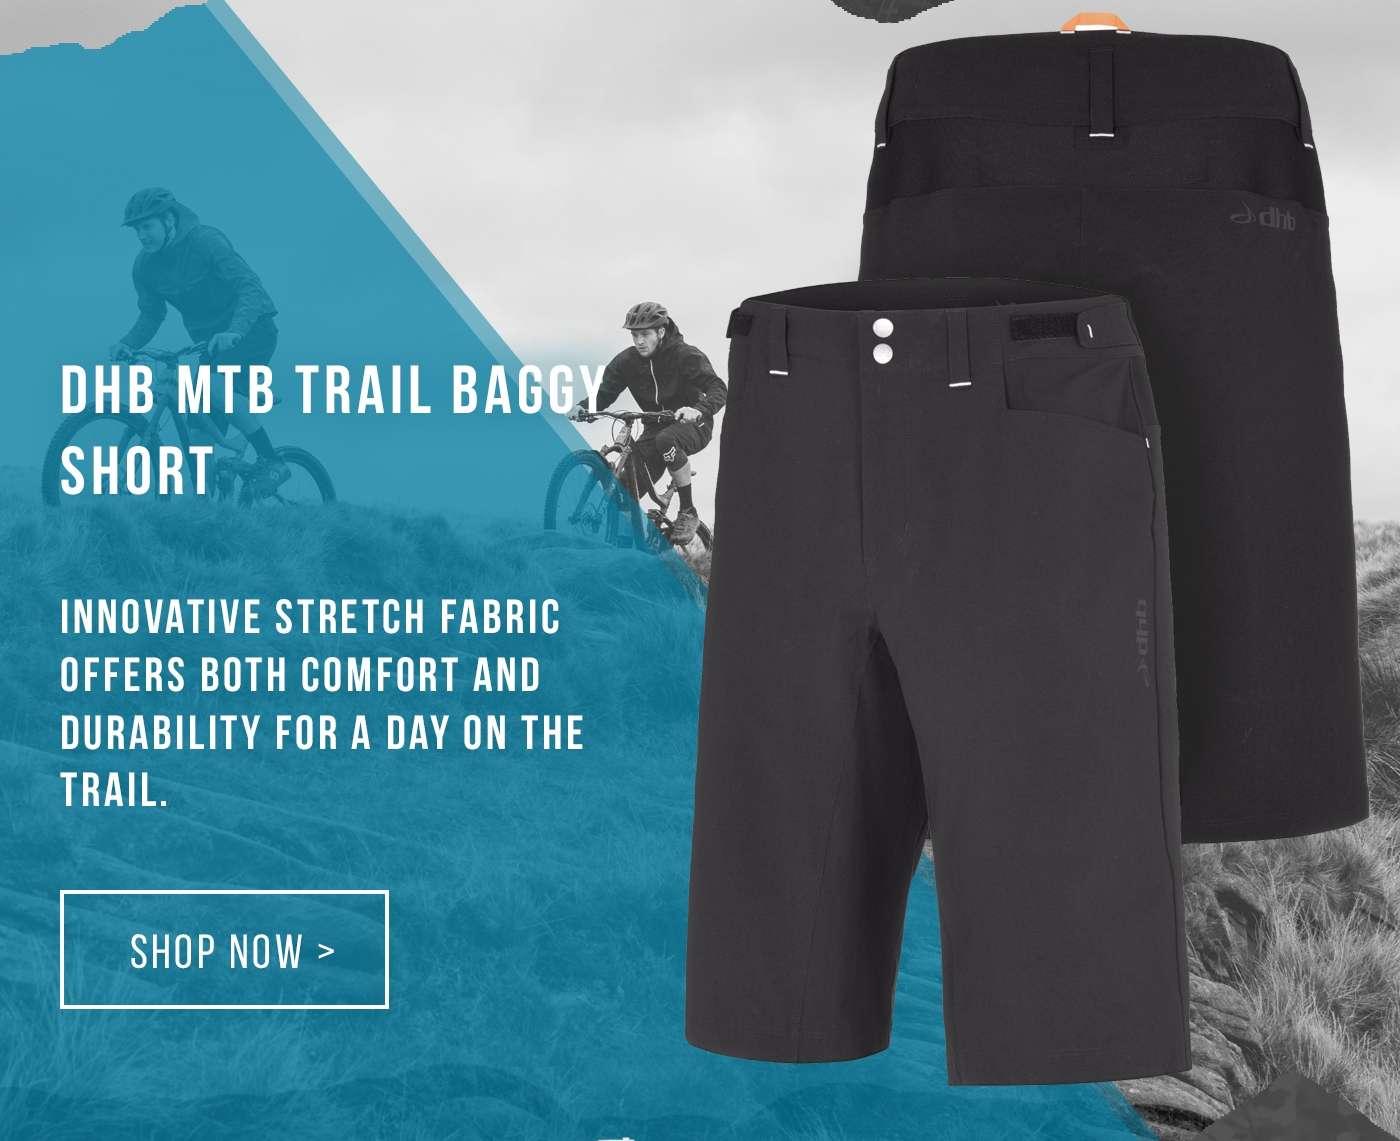 dhb MTB Trail Baggy Short